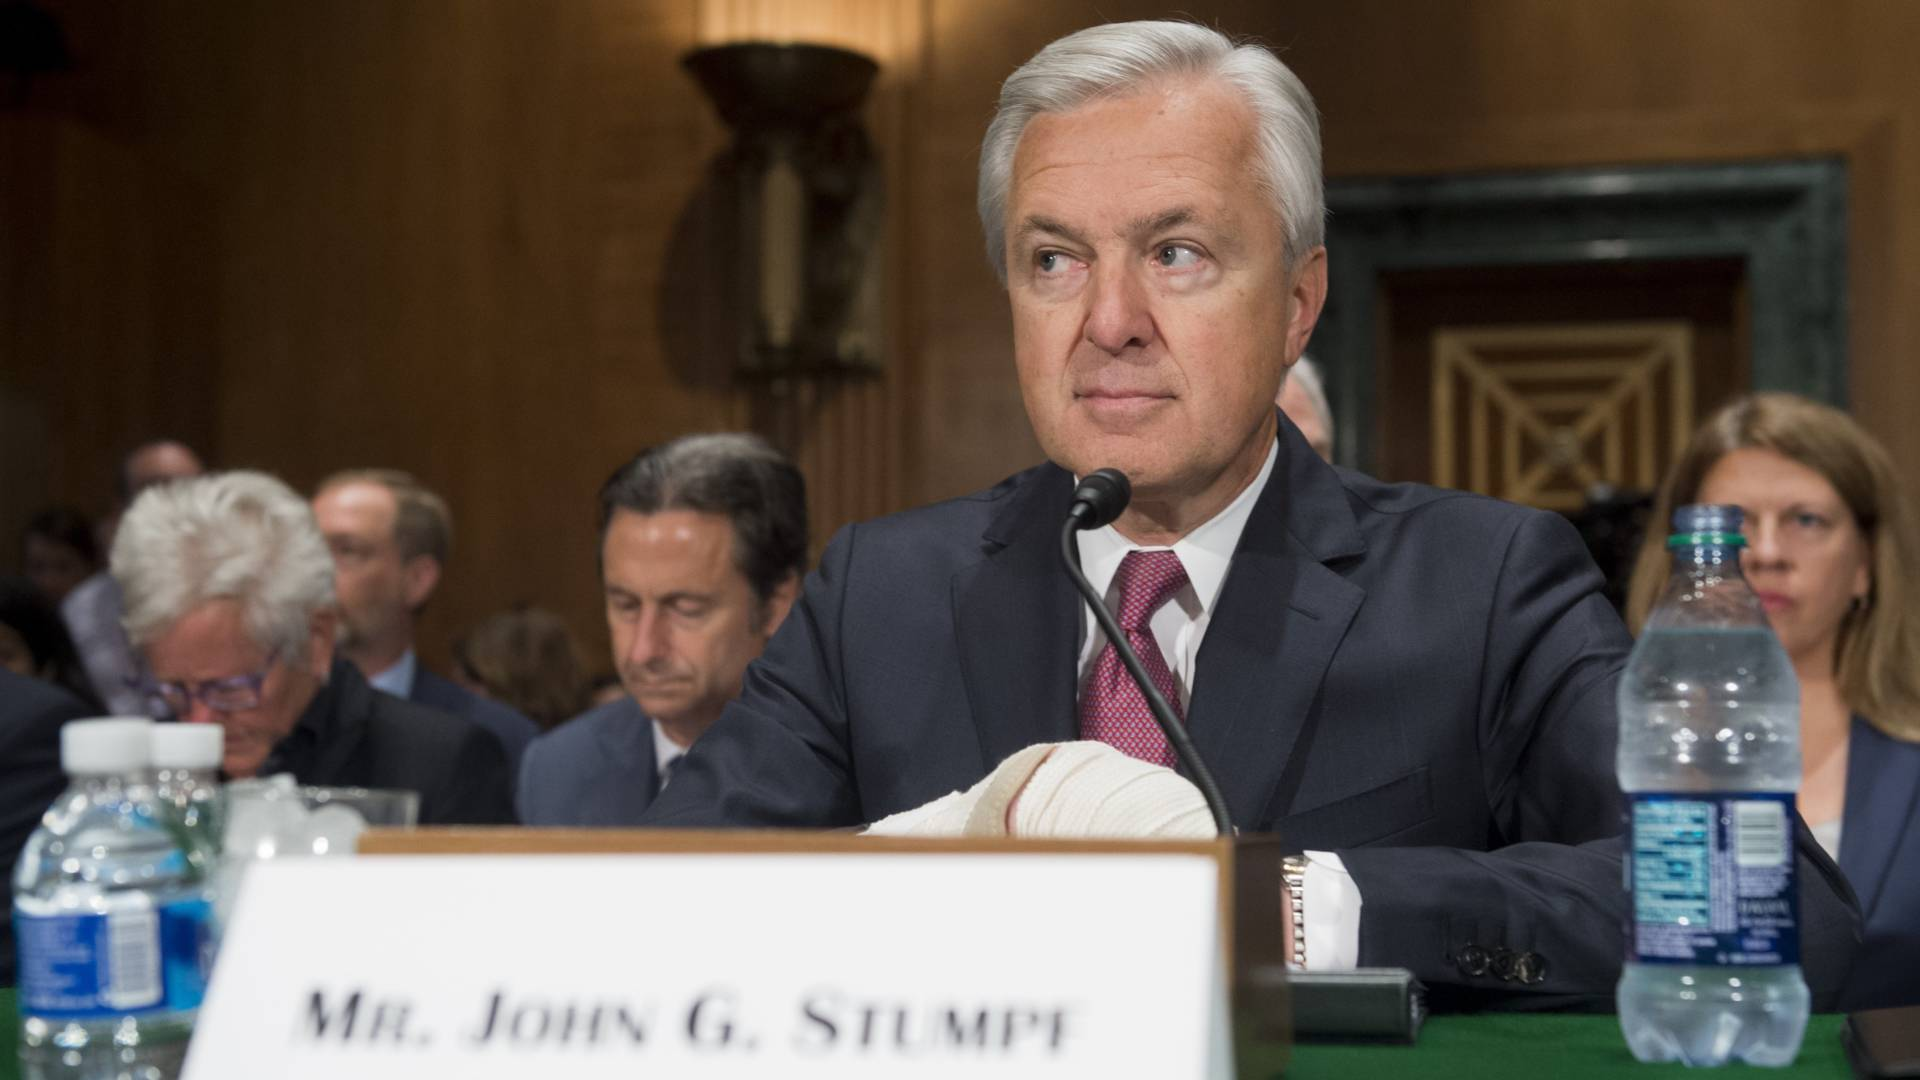 Wells Fargo CEO John Stumpf Resigns Amid Scandal